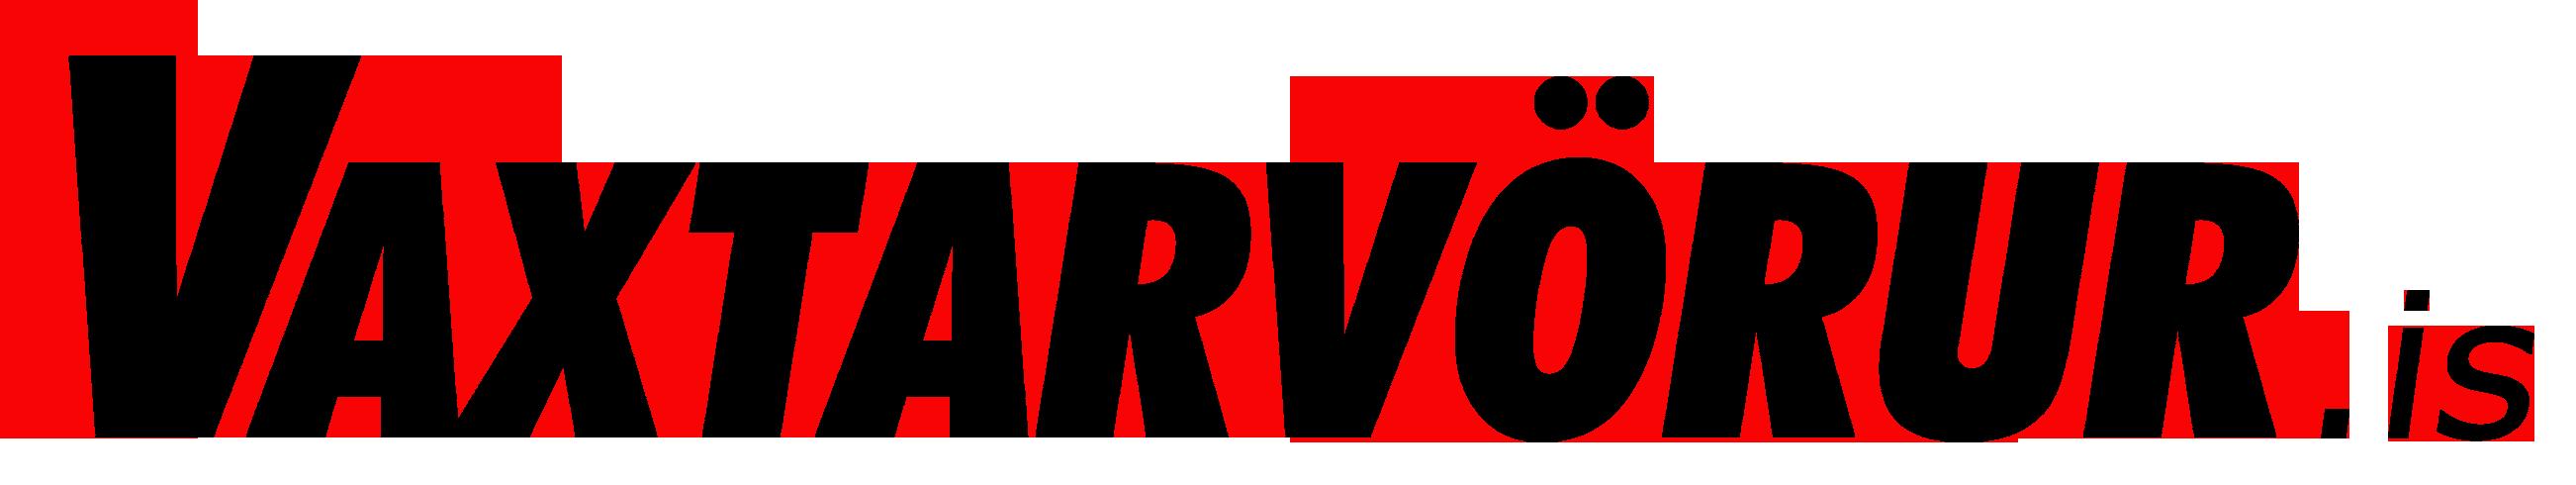 Vaxtarvörur